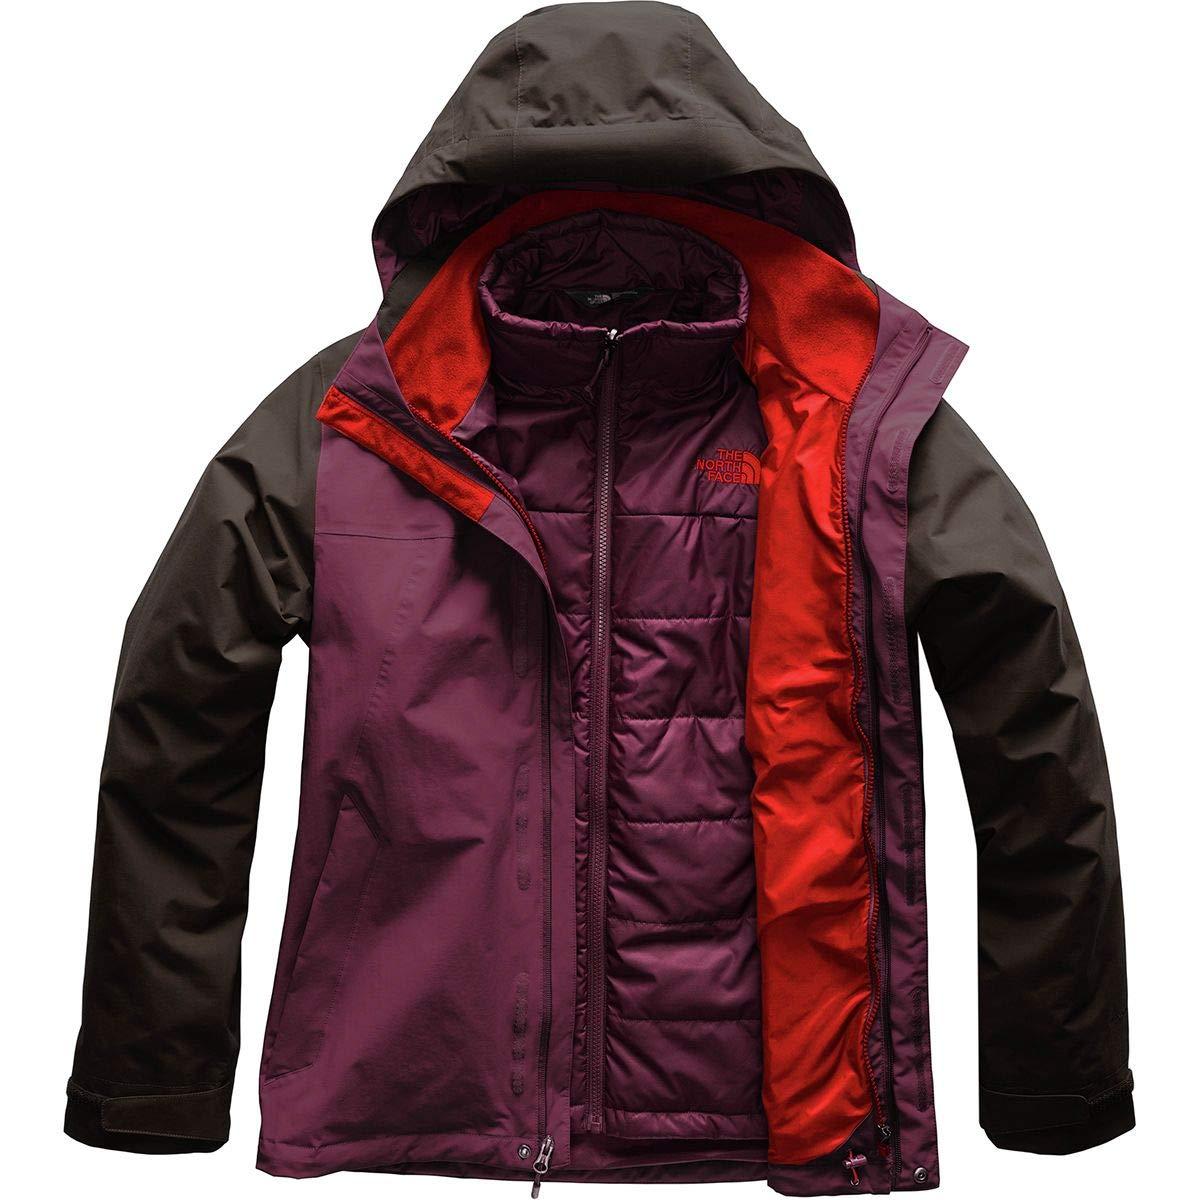 5f1efdccdb5 Amazon.com  The North Face Men s Carto Triclimate Jacket  Clothing